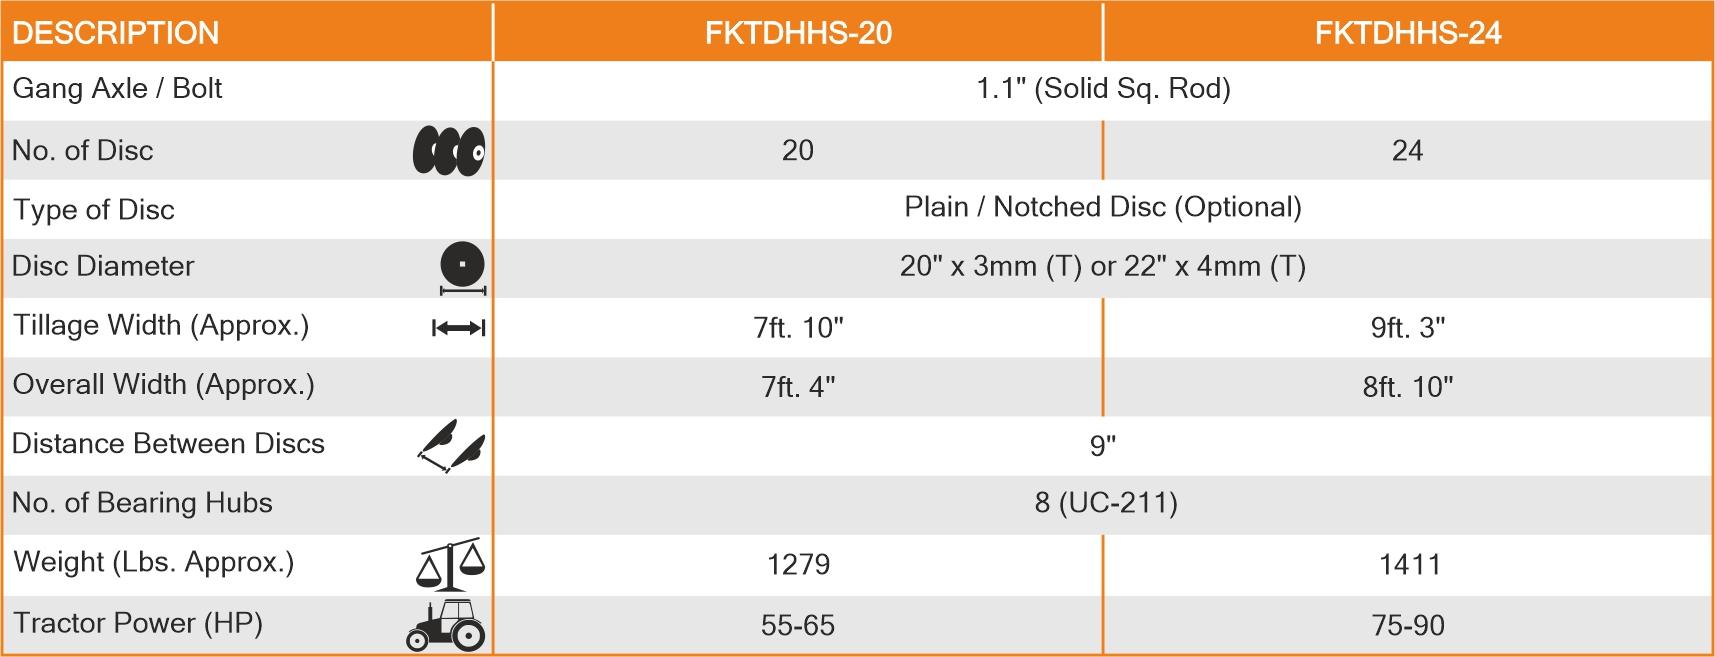 Tandem Disc Harrow Heavy Series Spectifications